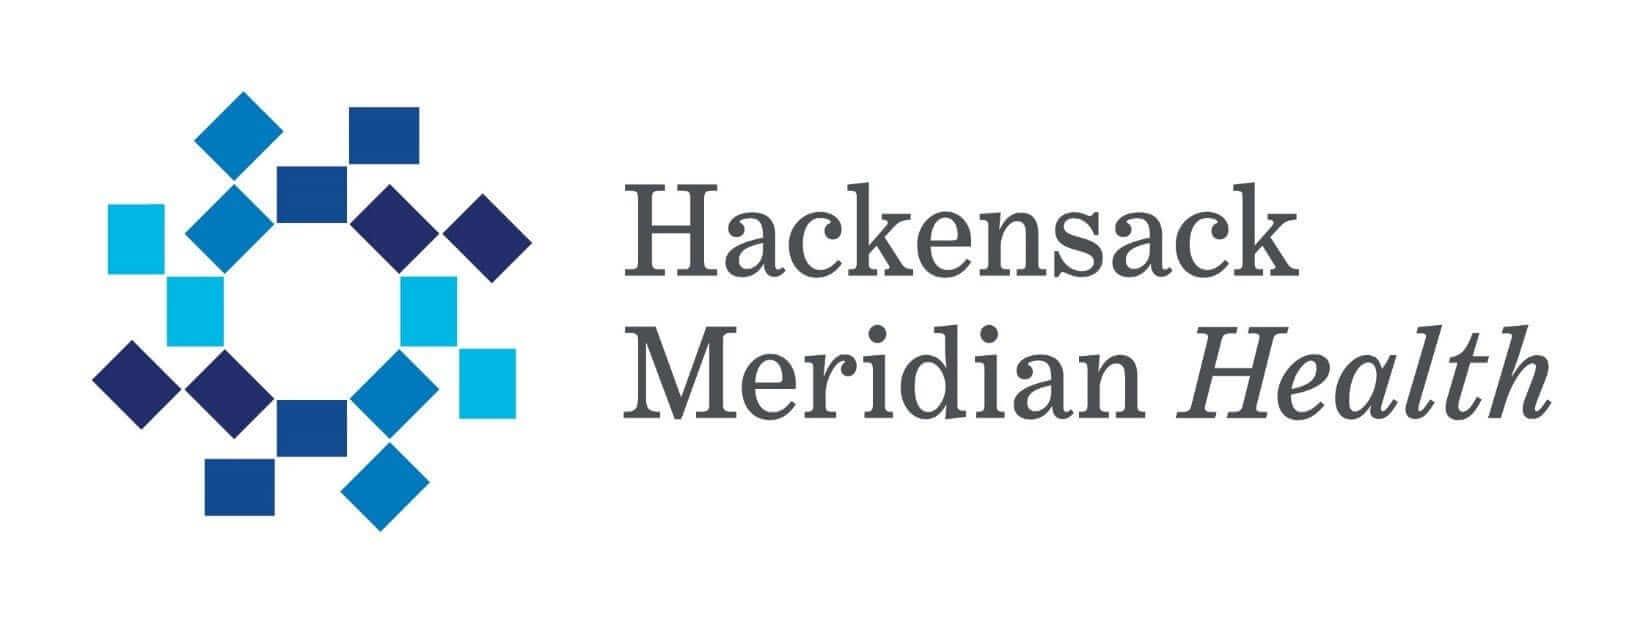 customer logo hackensack meridian health